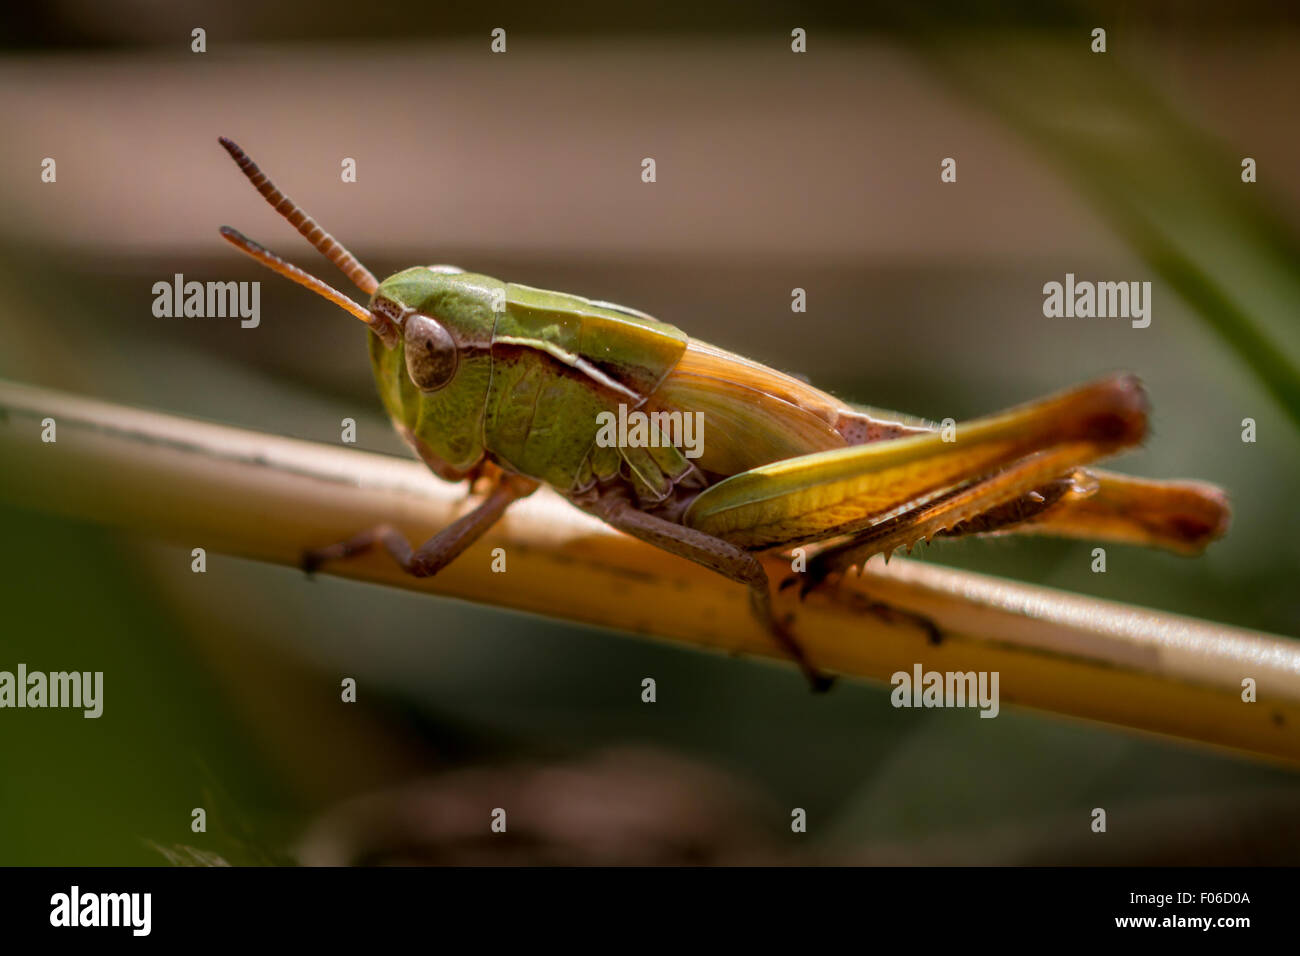 Meadow grasshopper - Stock Image